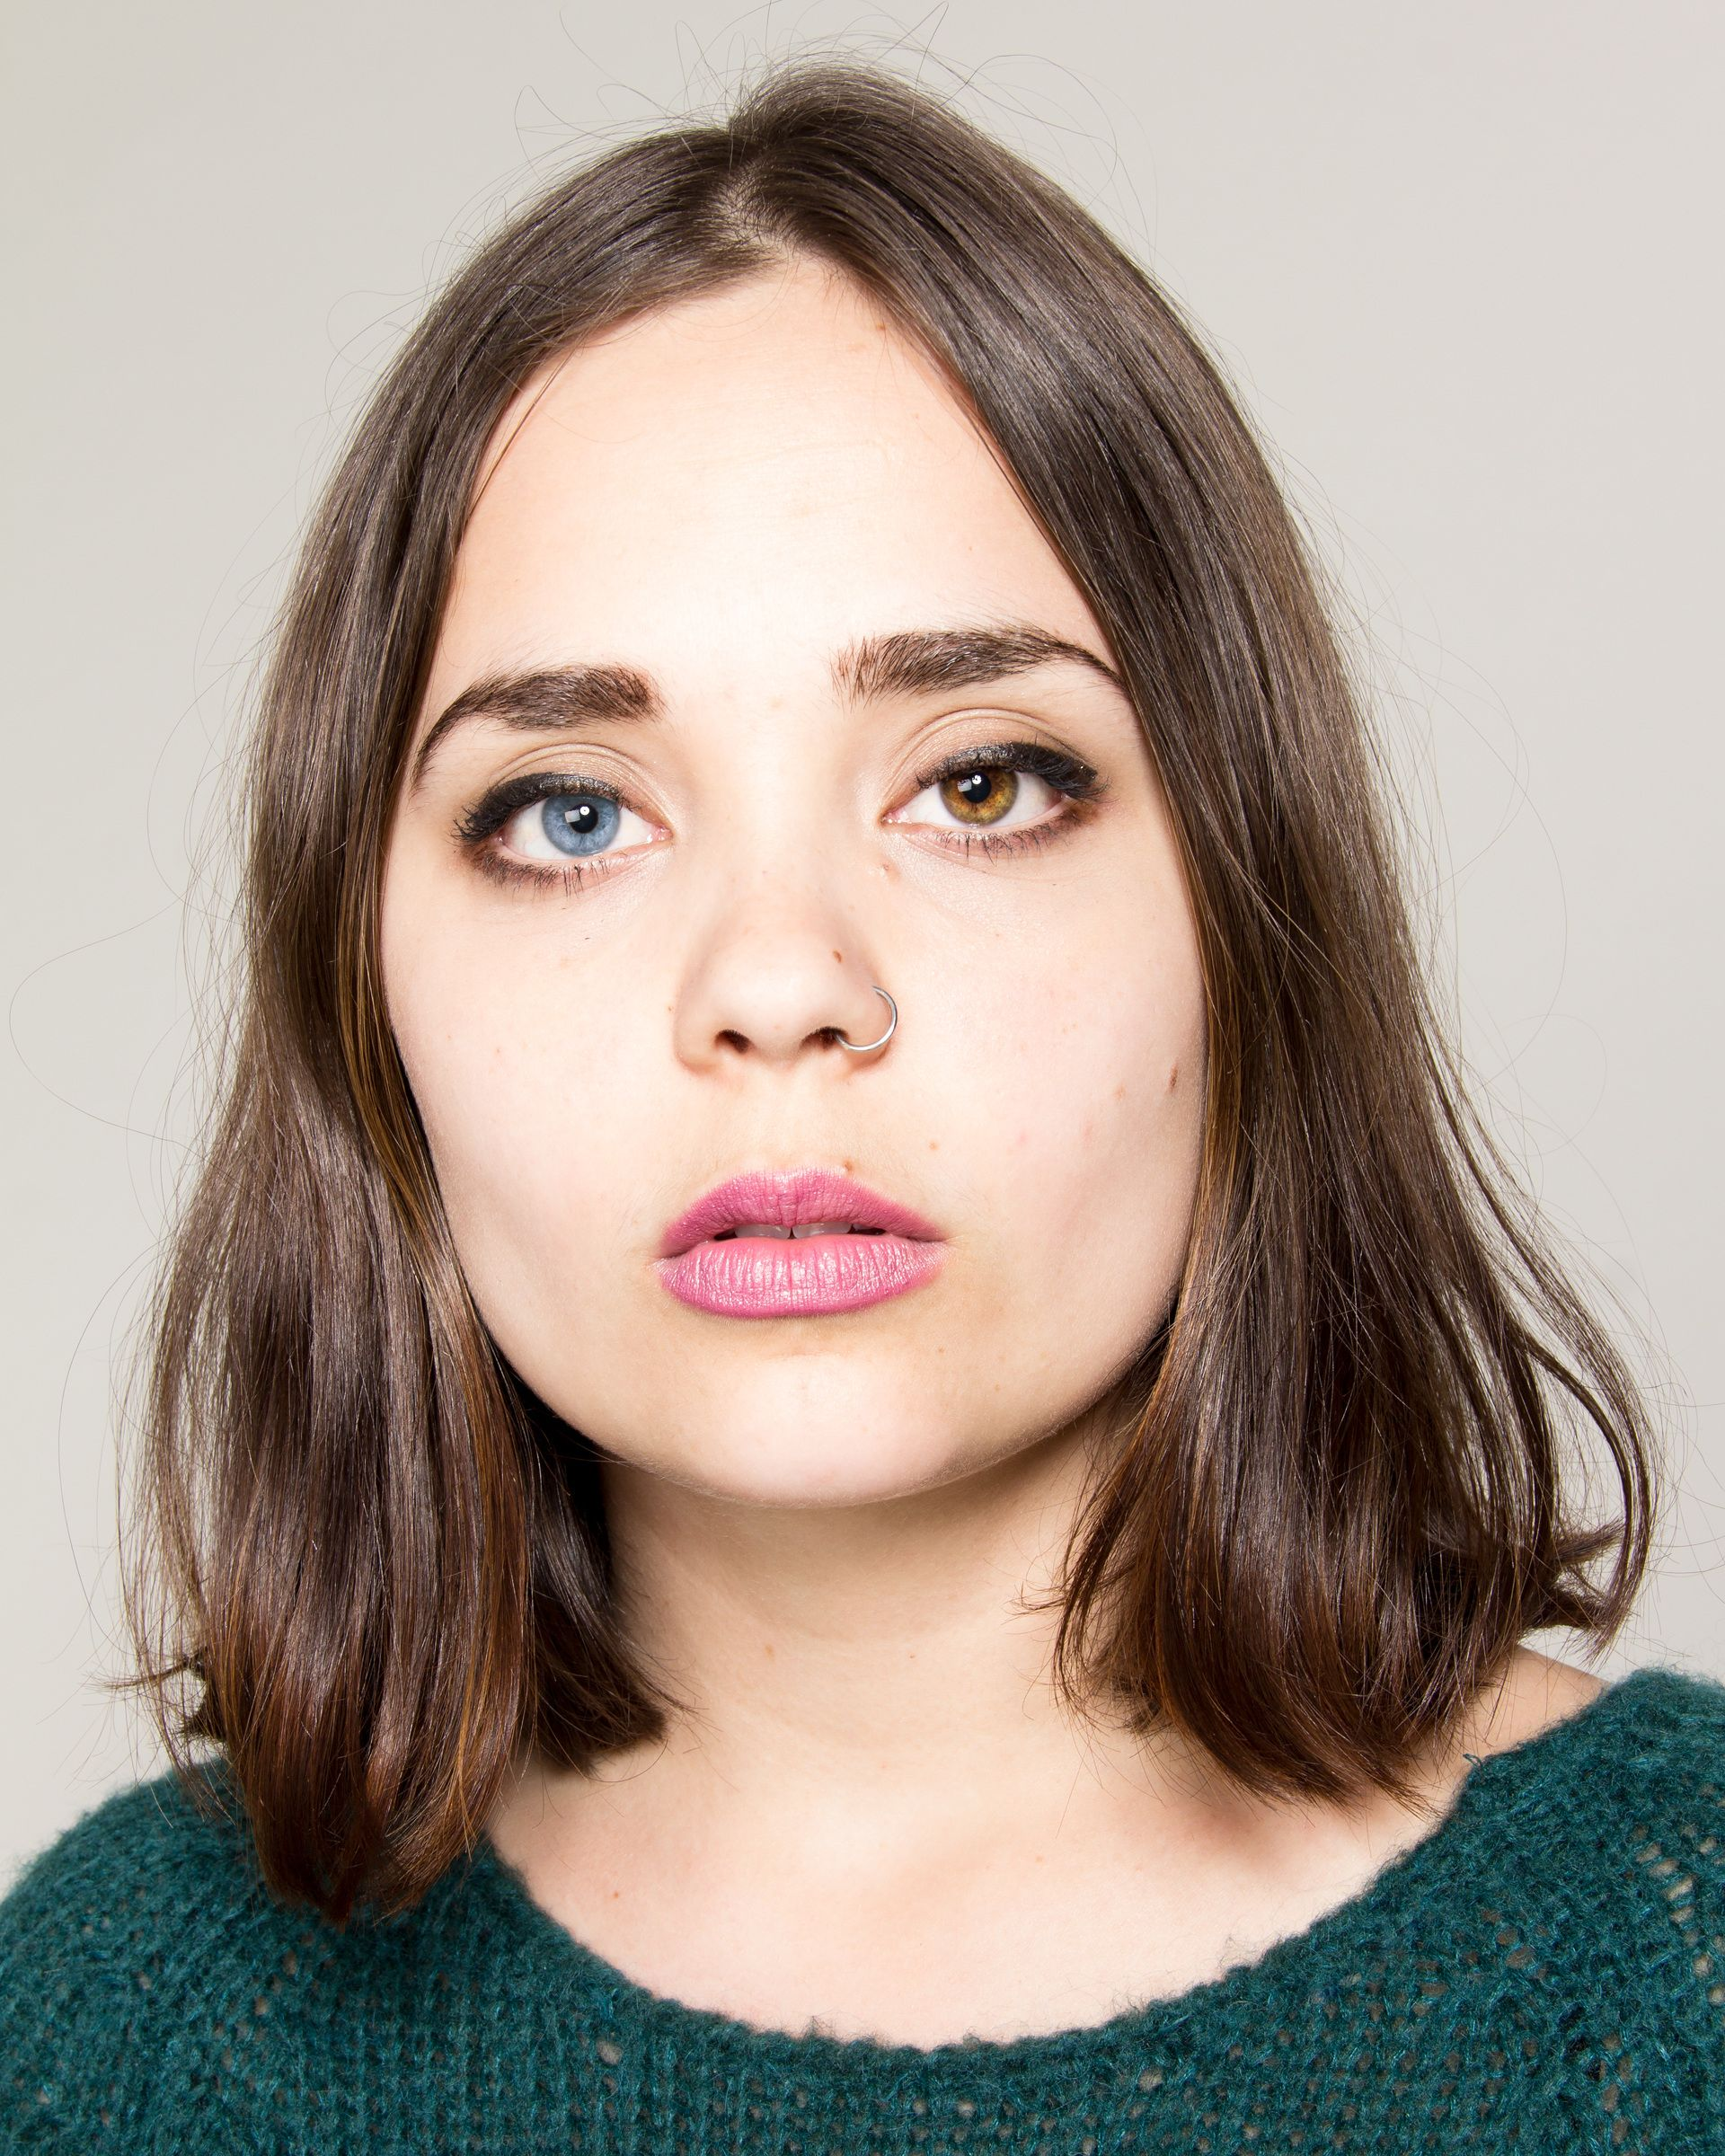 Quicklist 57 Beautiful Russian Women